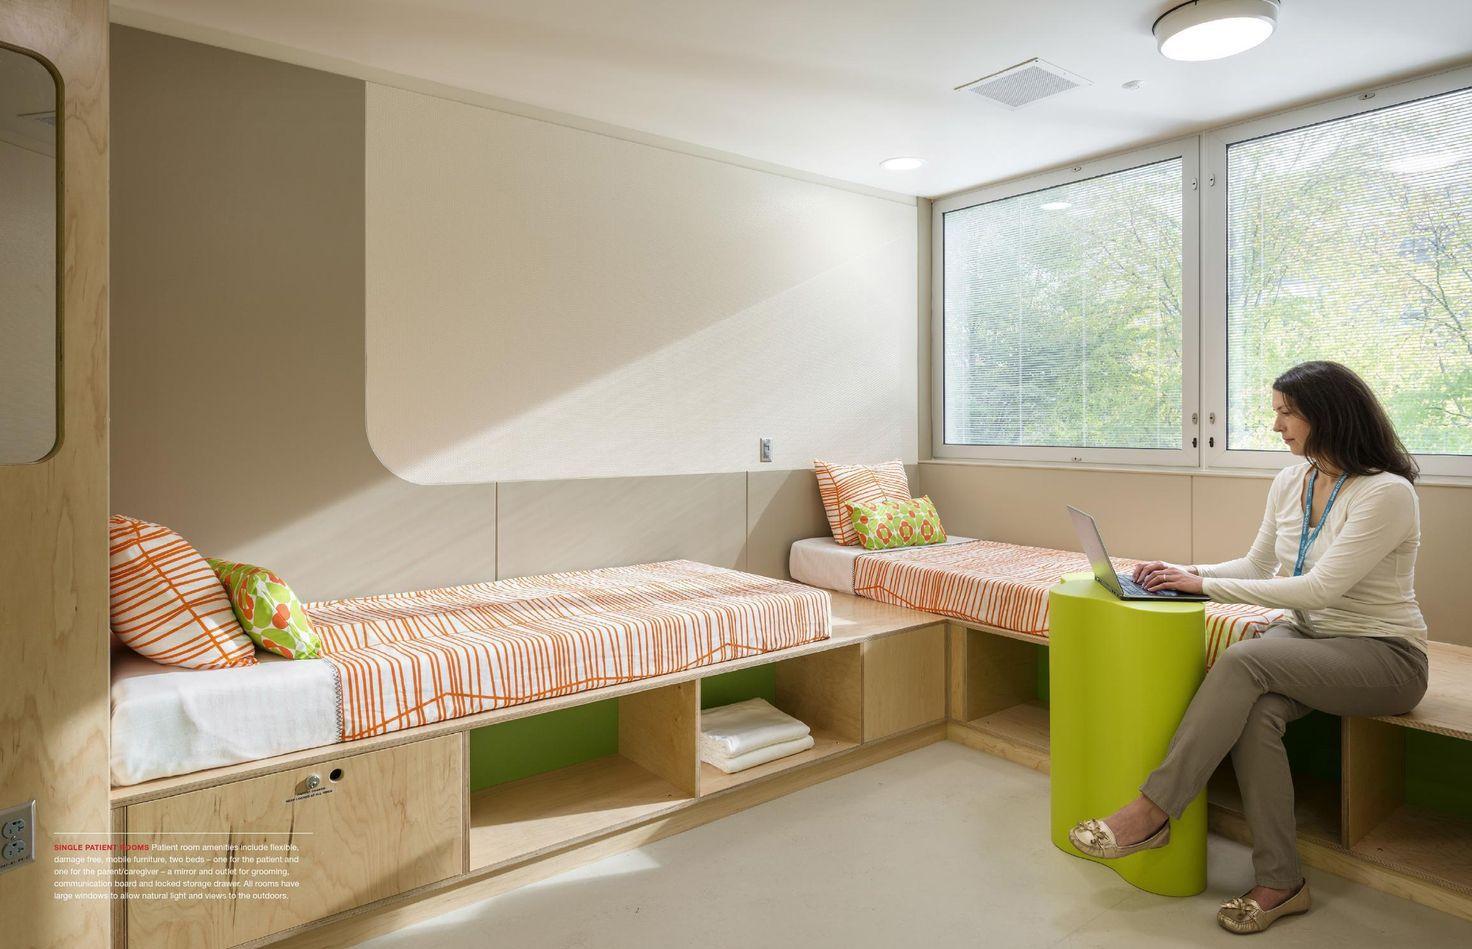 Seattle Children S Hospital Psychiatry And Behavioral Medicine Unit